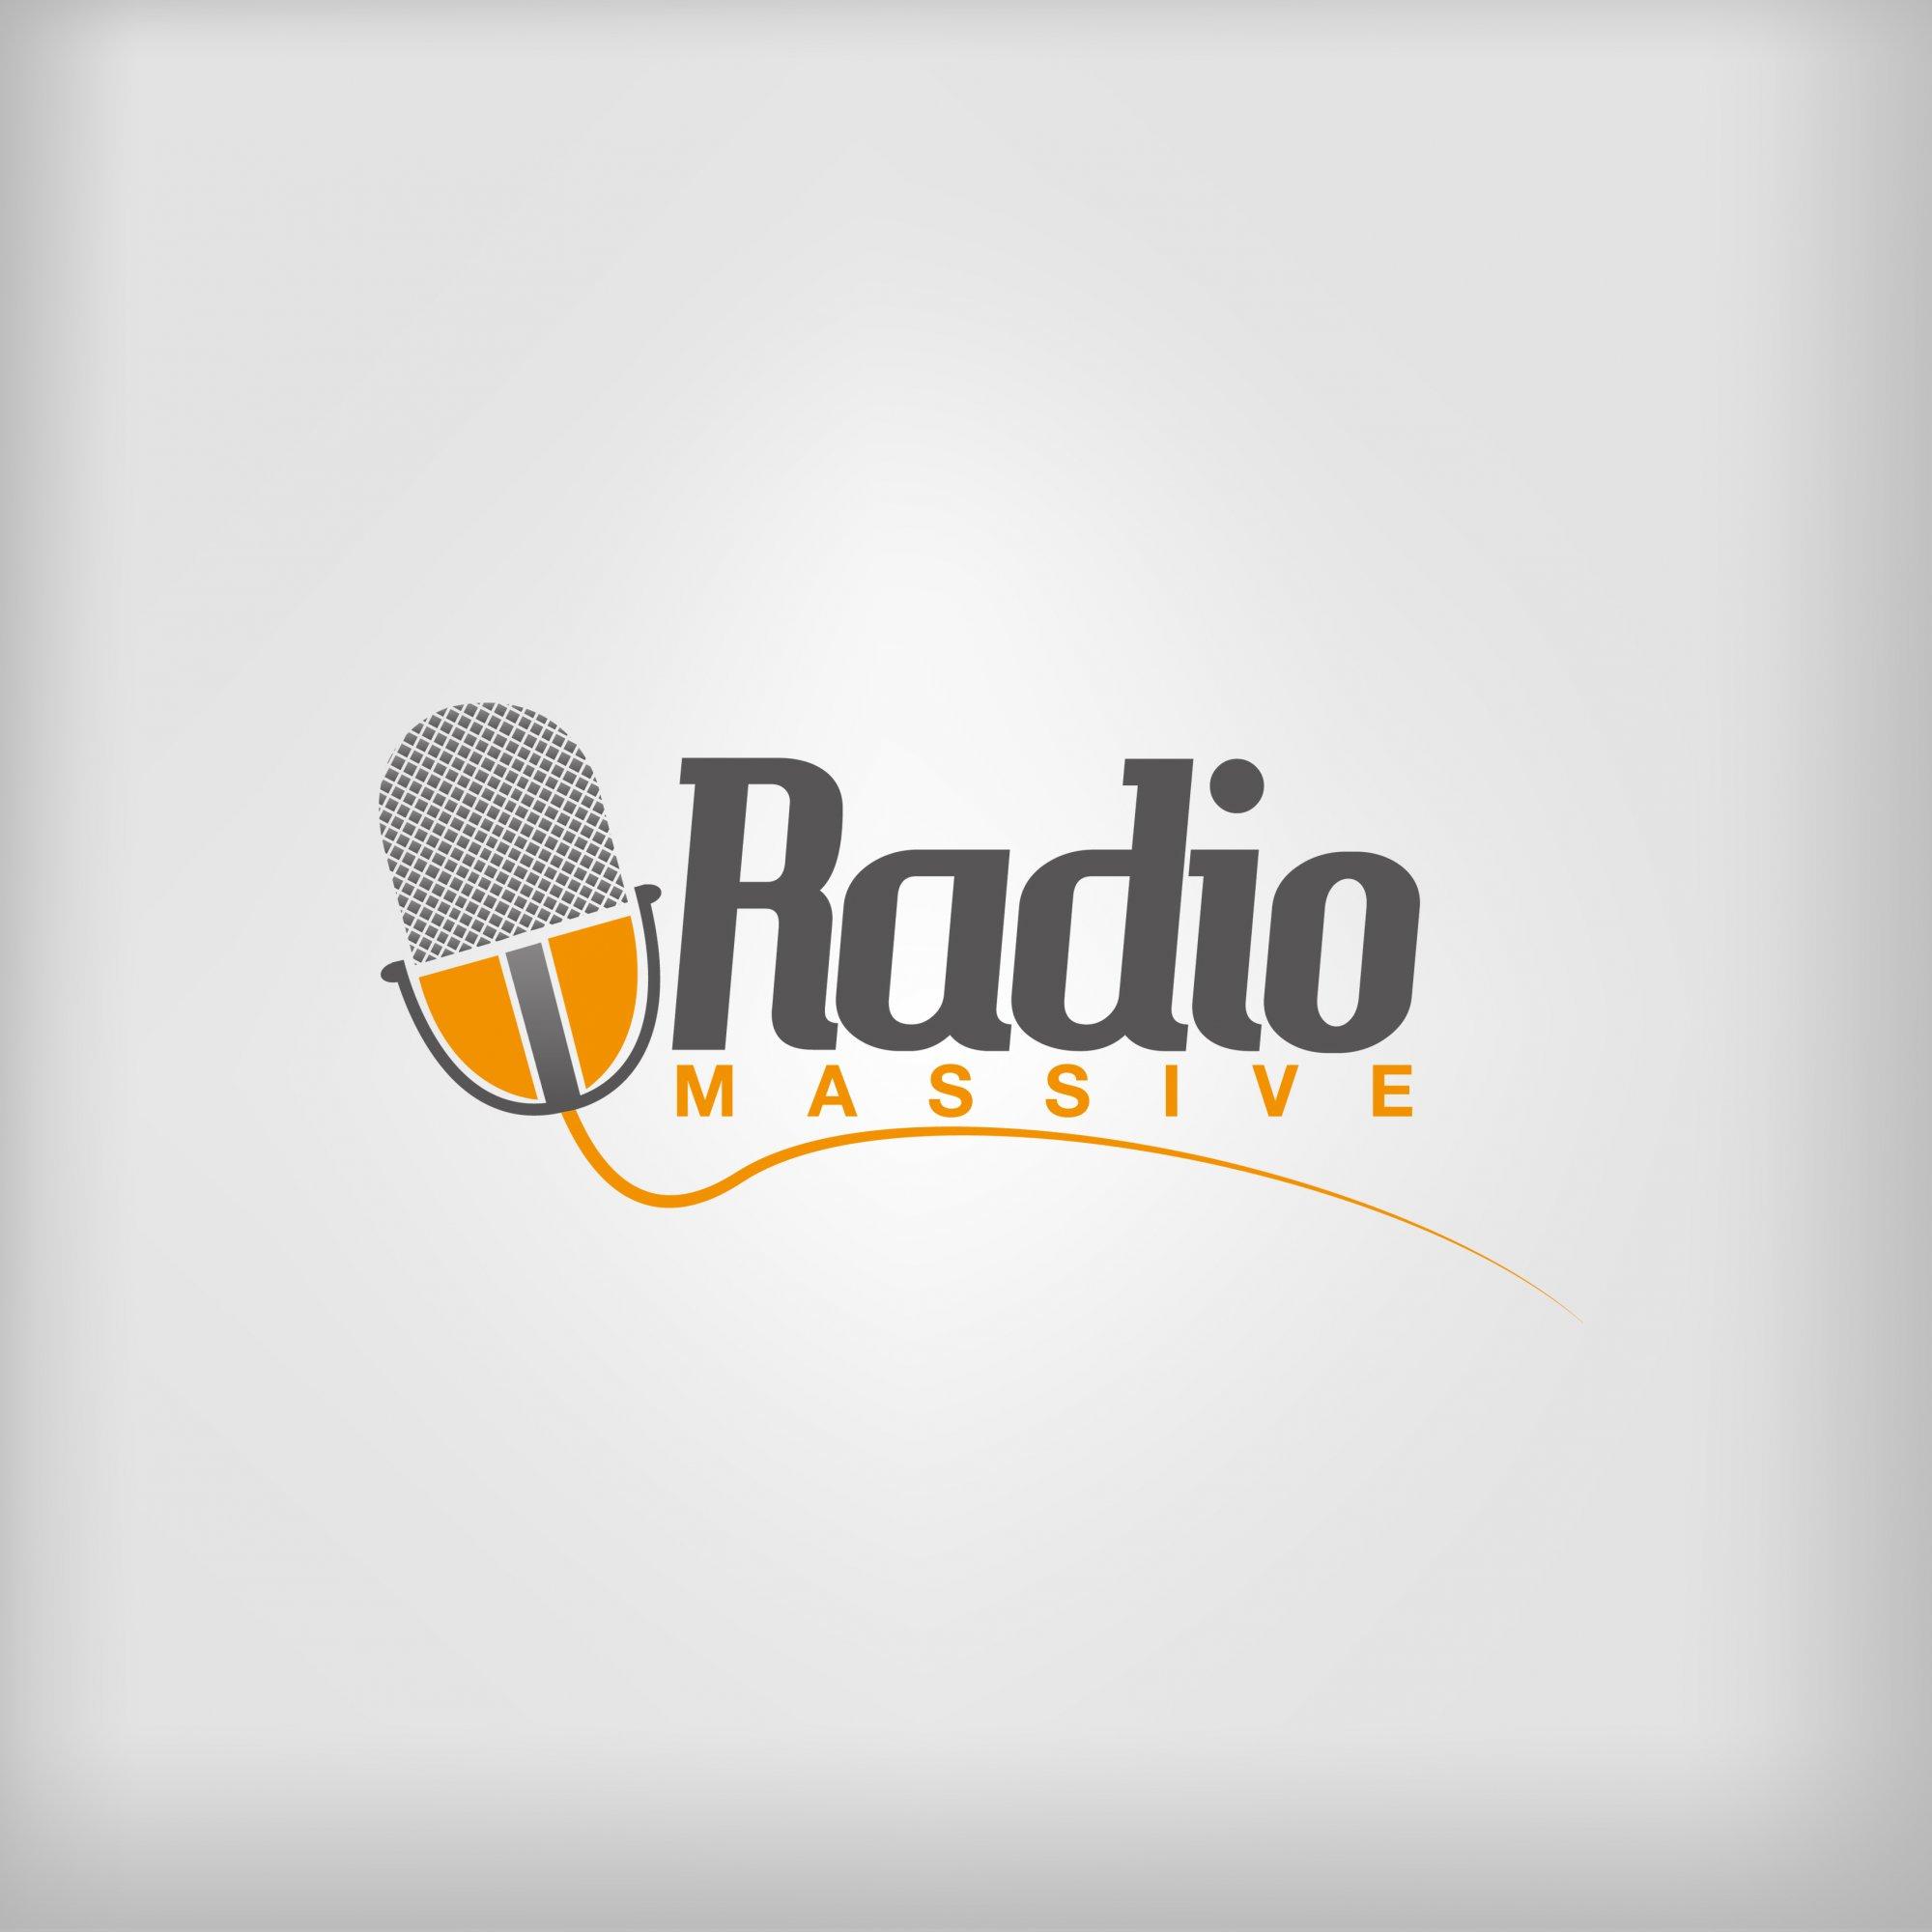 radio massive brands of the world� download vector